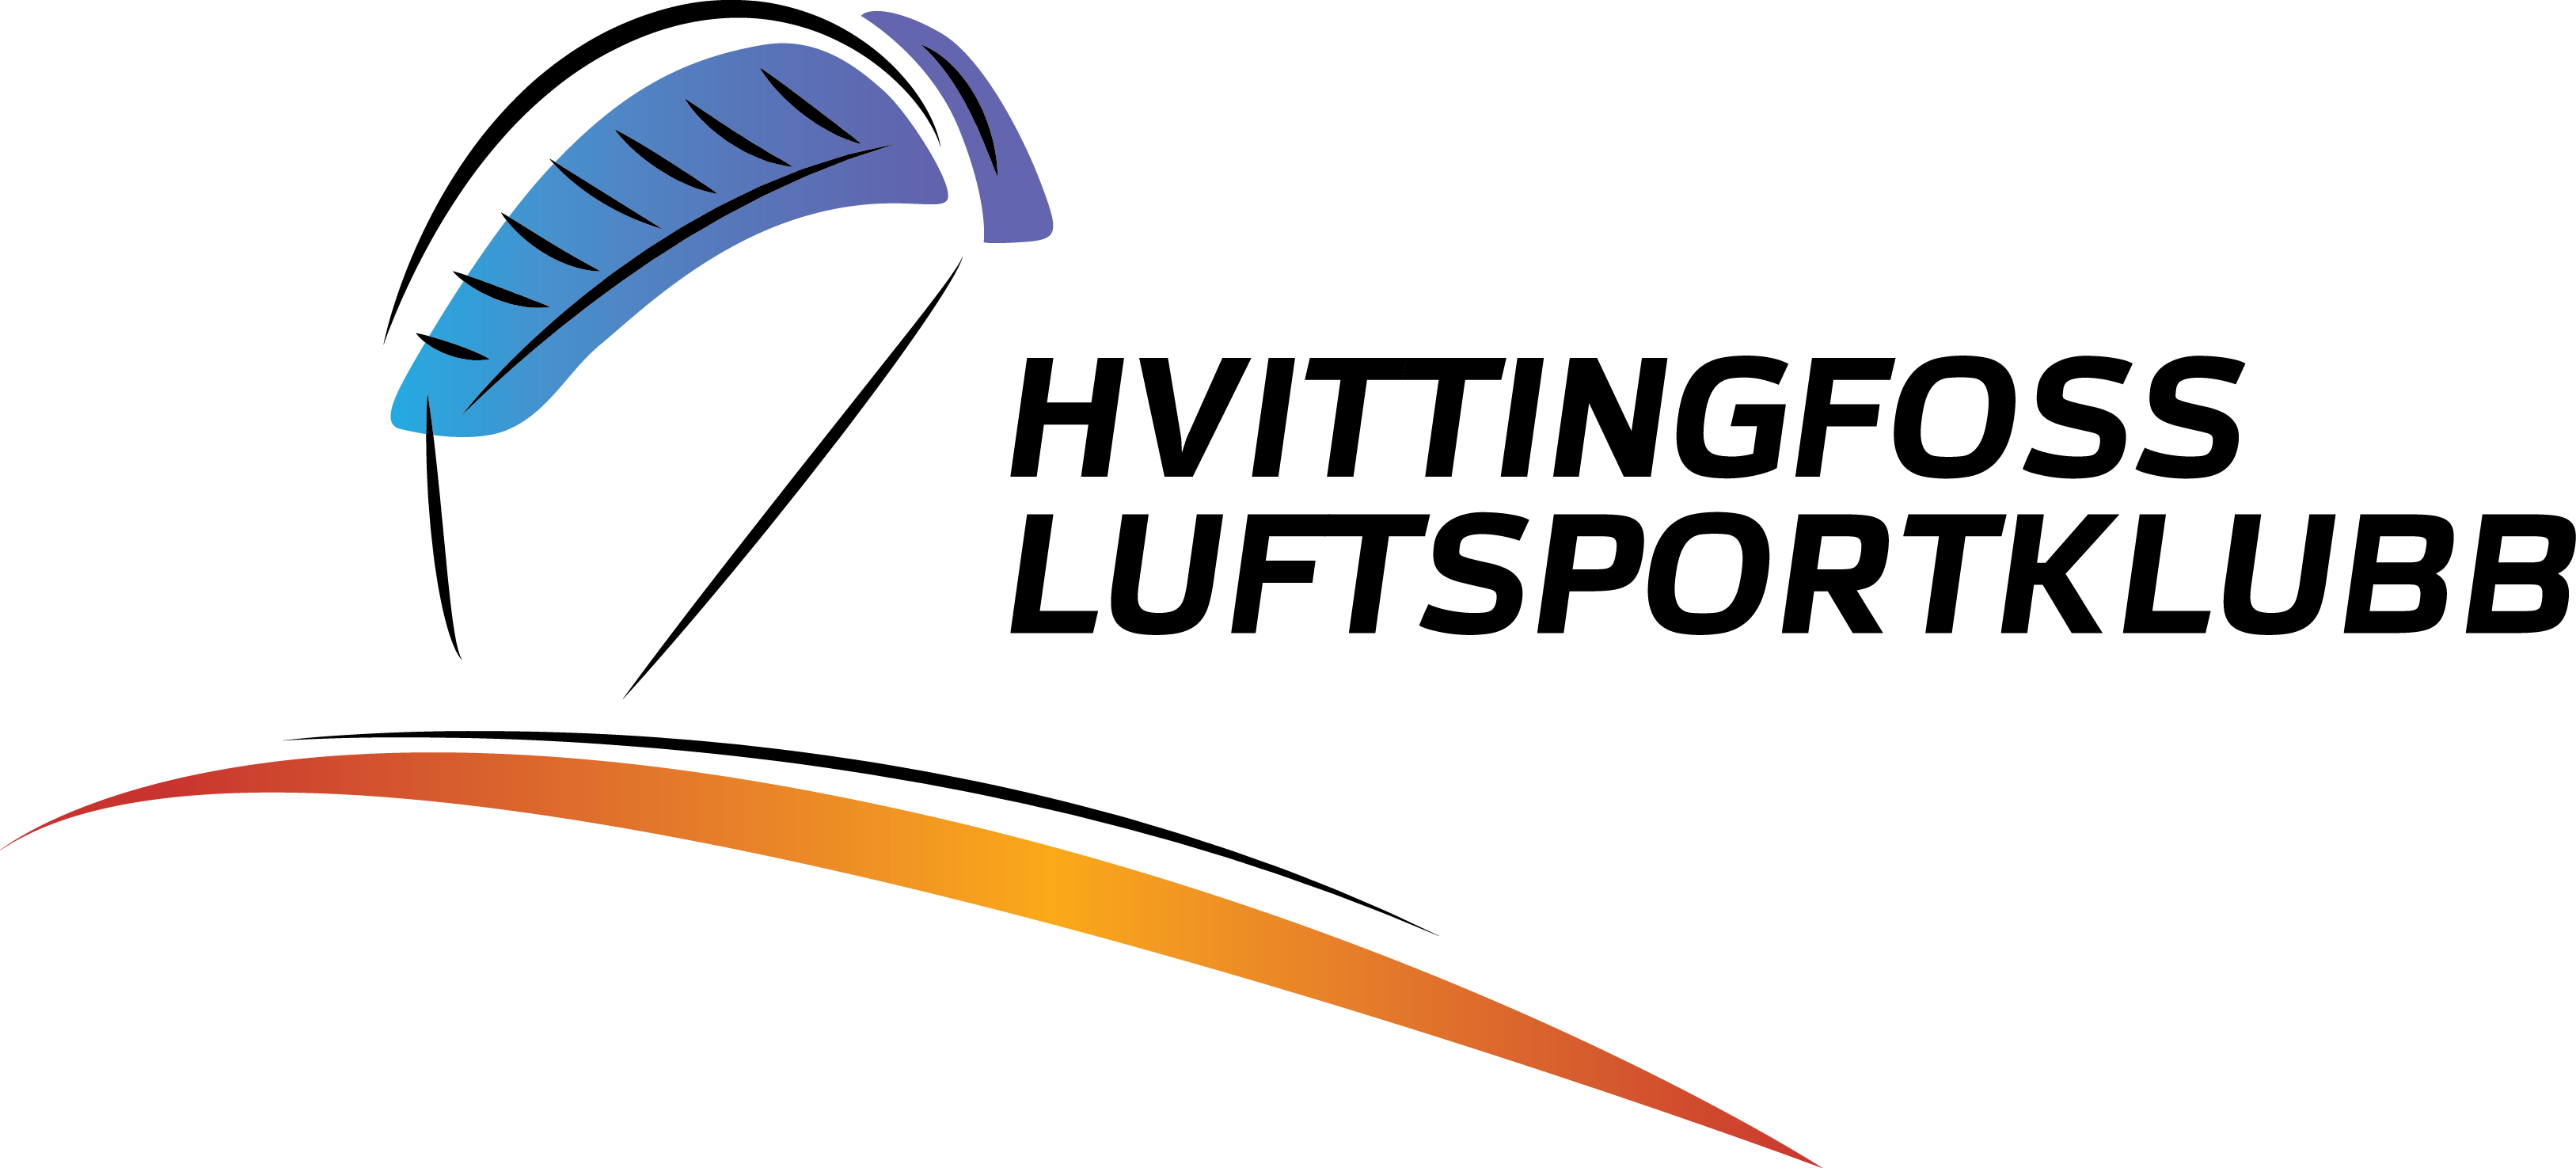 Hvittingfoss Luftsportklubb